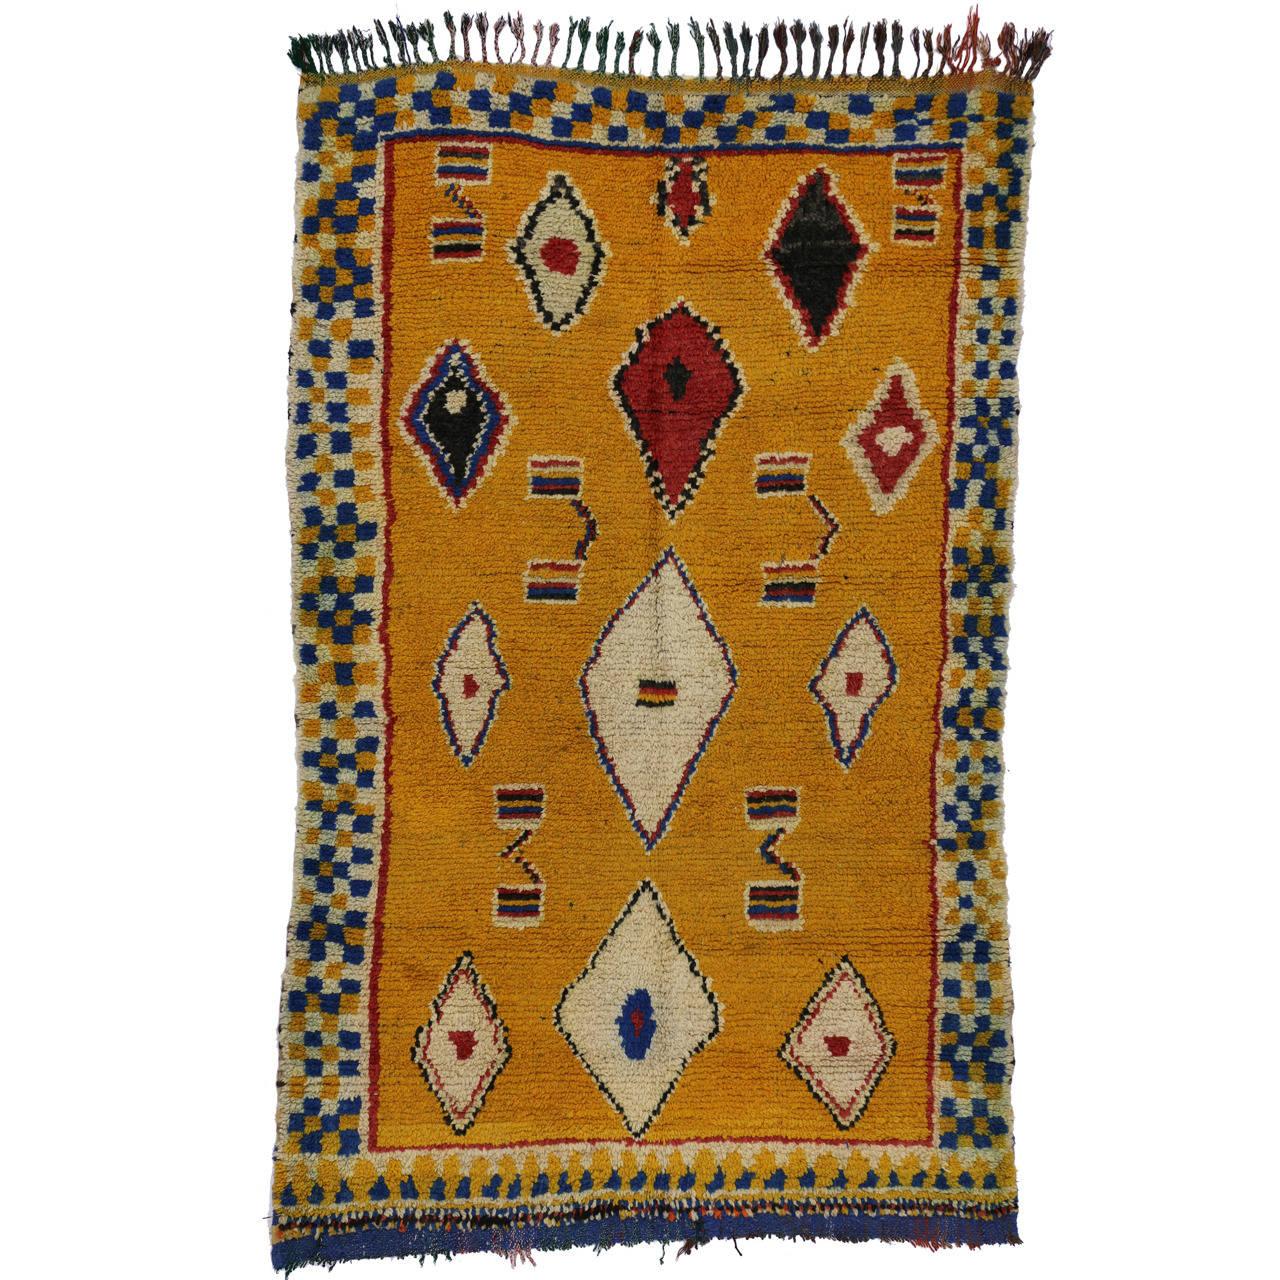 Maroc Tribal Rug: Vintage Berber Moroccan Rug With Modern Tribal Design